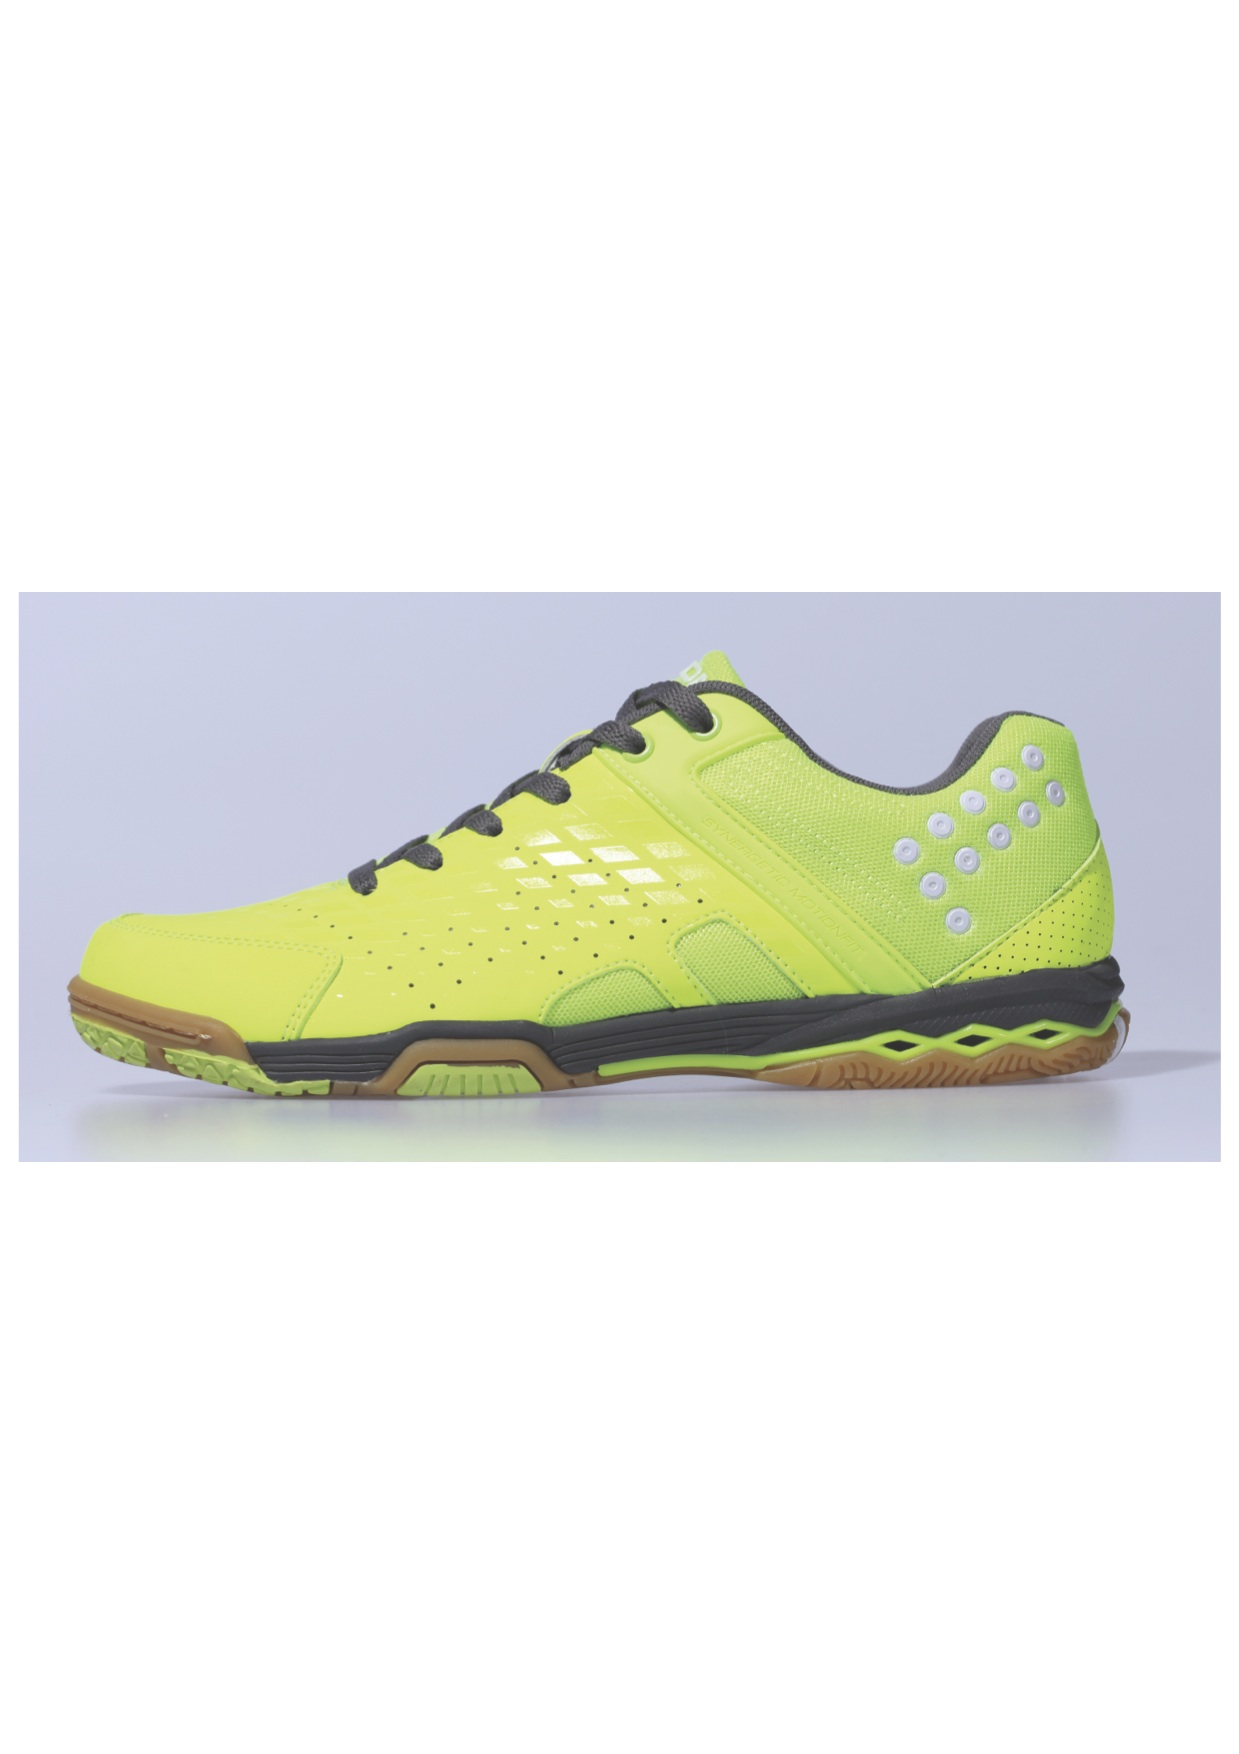 Phenomenal Xiom Table Tennis Shoes Oscar Fluorescent Yellow Table Tennis Shoes Xlnt Sports Interior Design Ideas Oteneahmetsinanyavuzinfo